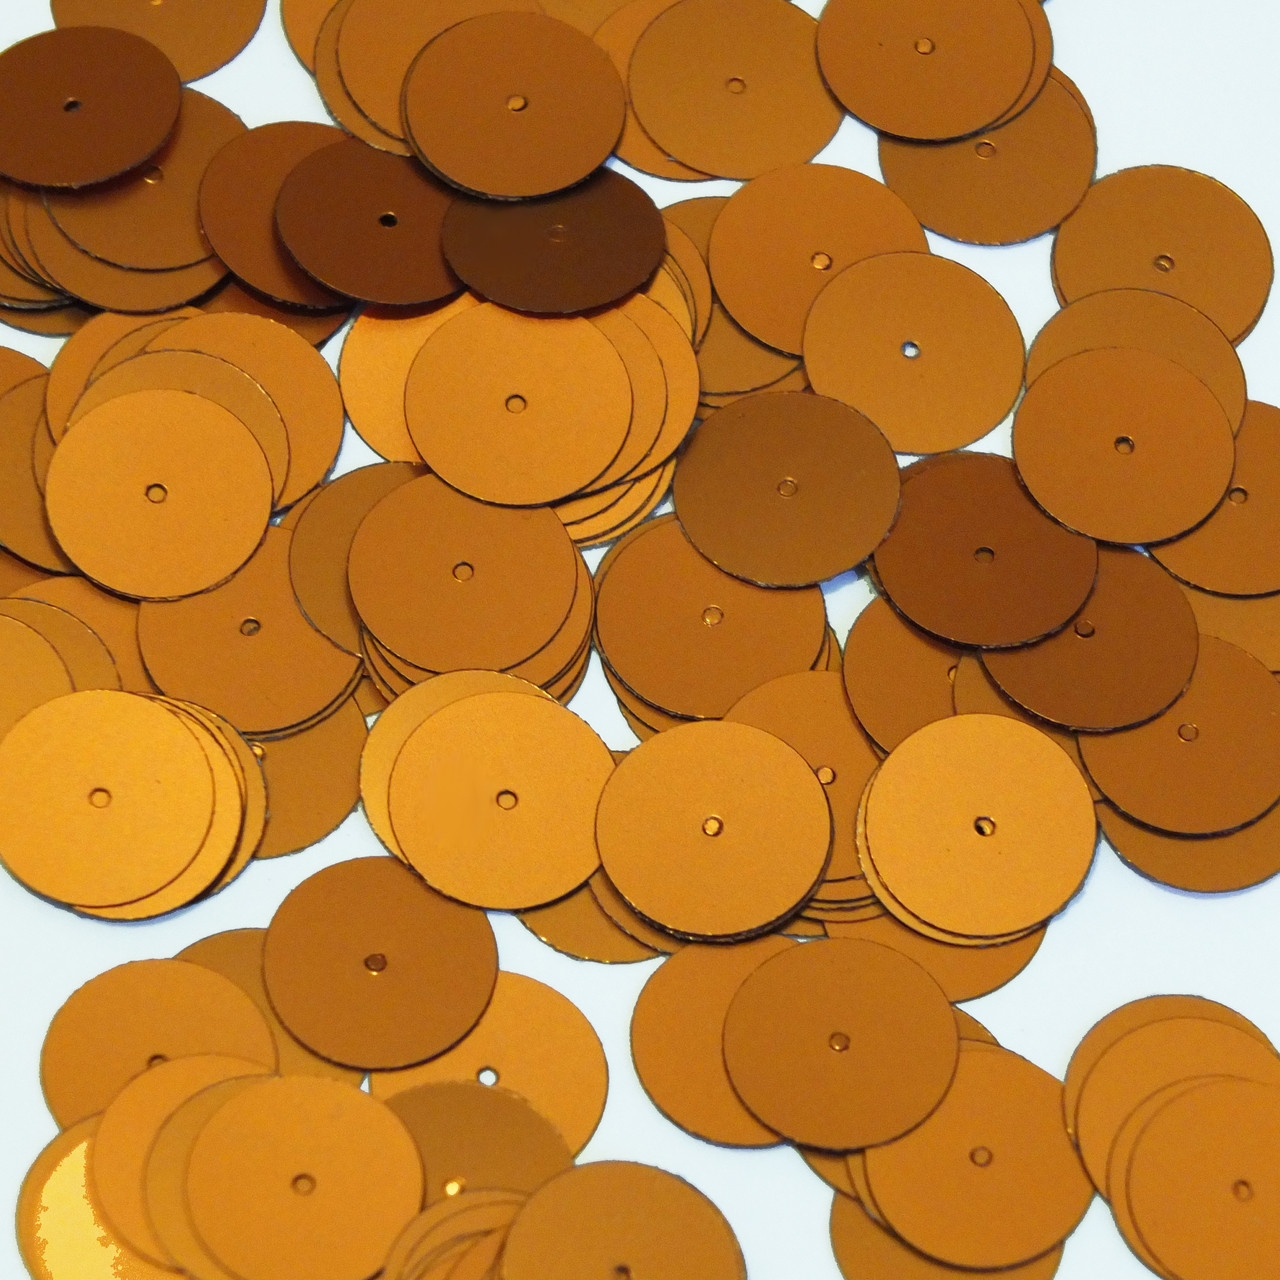 Round Sequin 15mm Orange Matte Satin Metallic Couture Paillettes